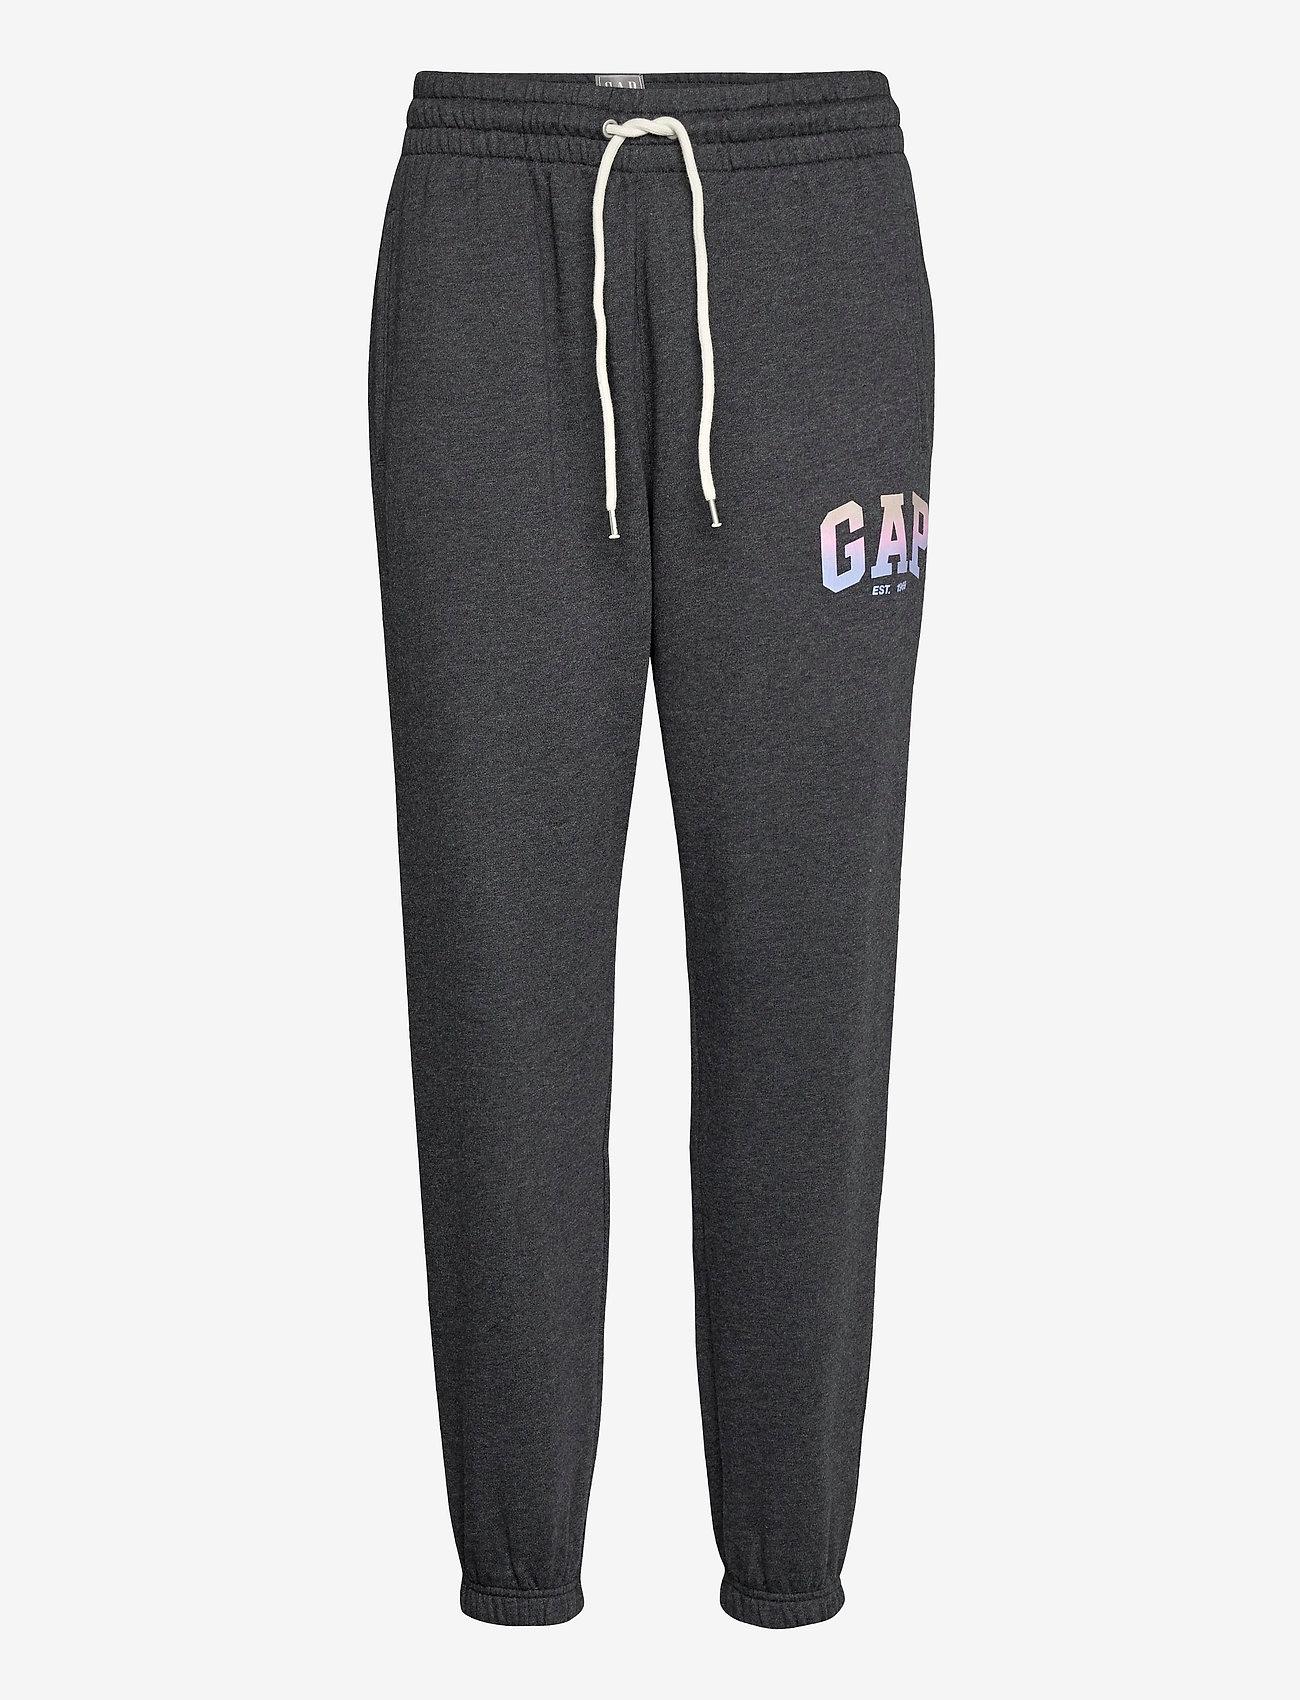 GAP - GAP SHINE JOGGER - sweatpants - charcoal heather - 0